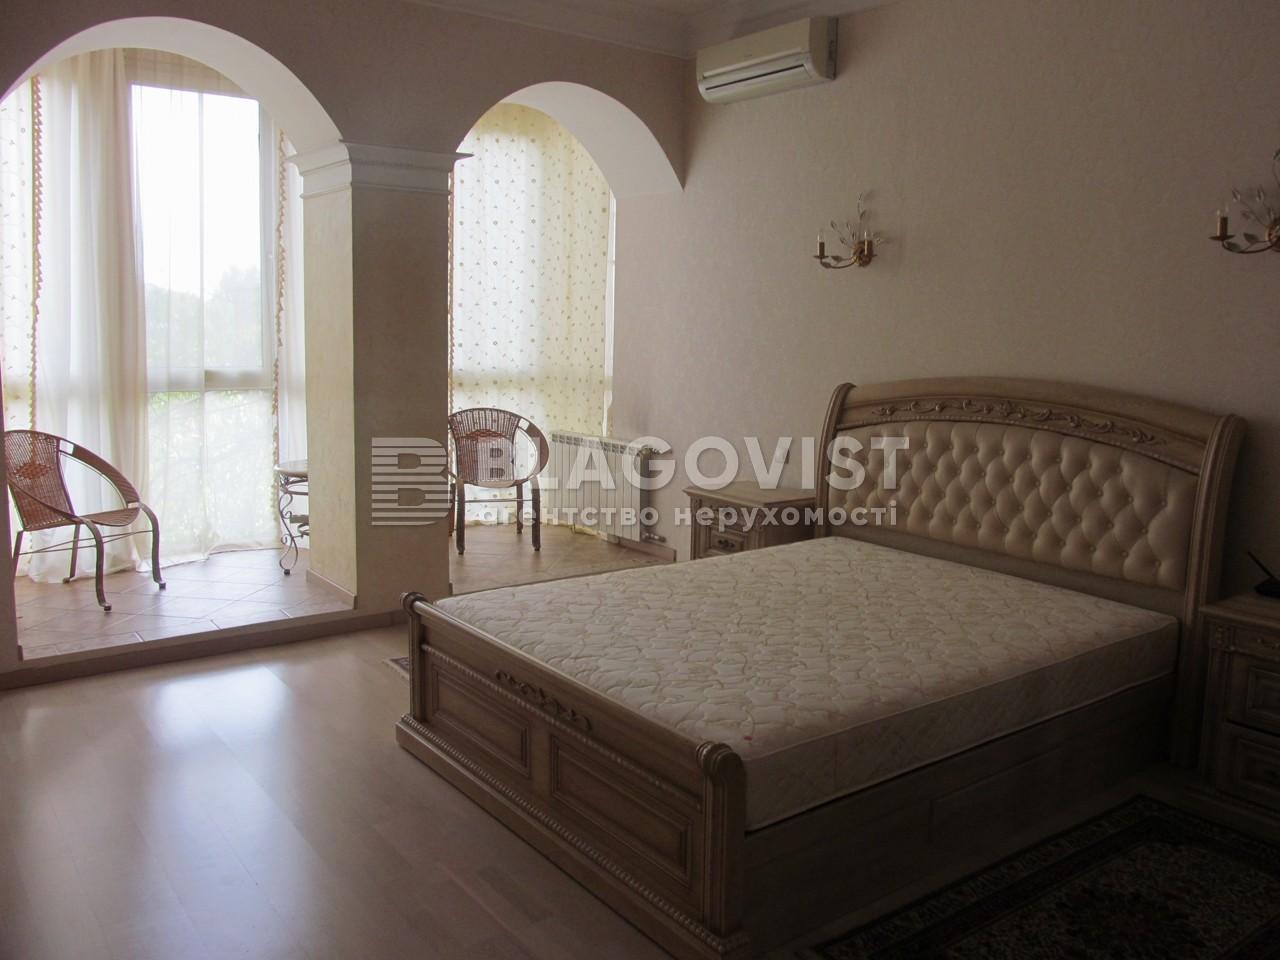 Квартира D-33009, Толстого Льва, 15, Киев - Фото 6